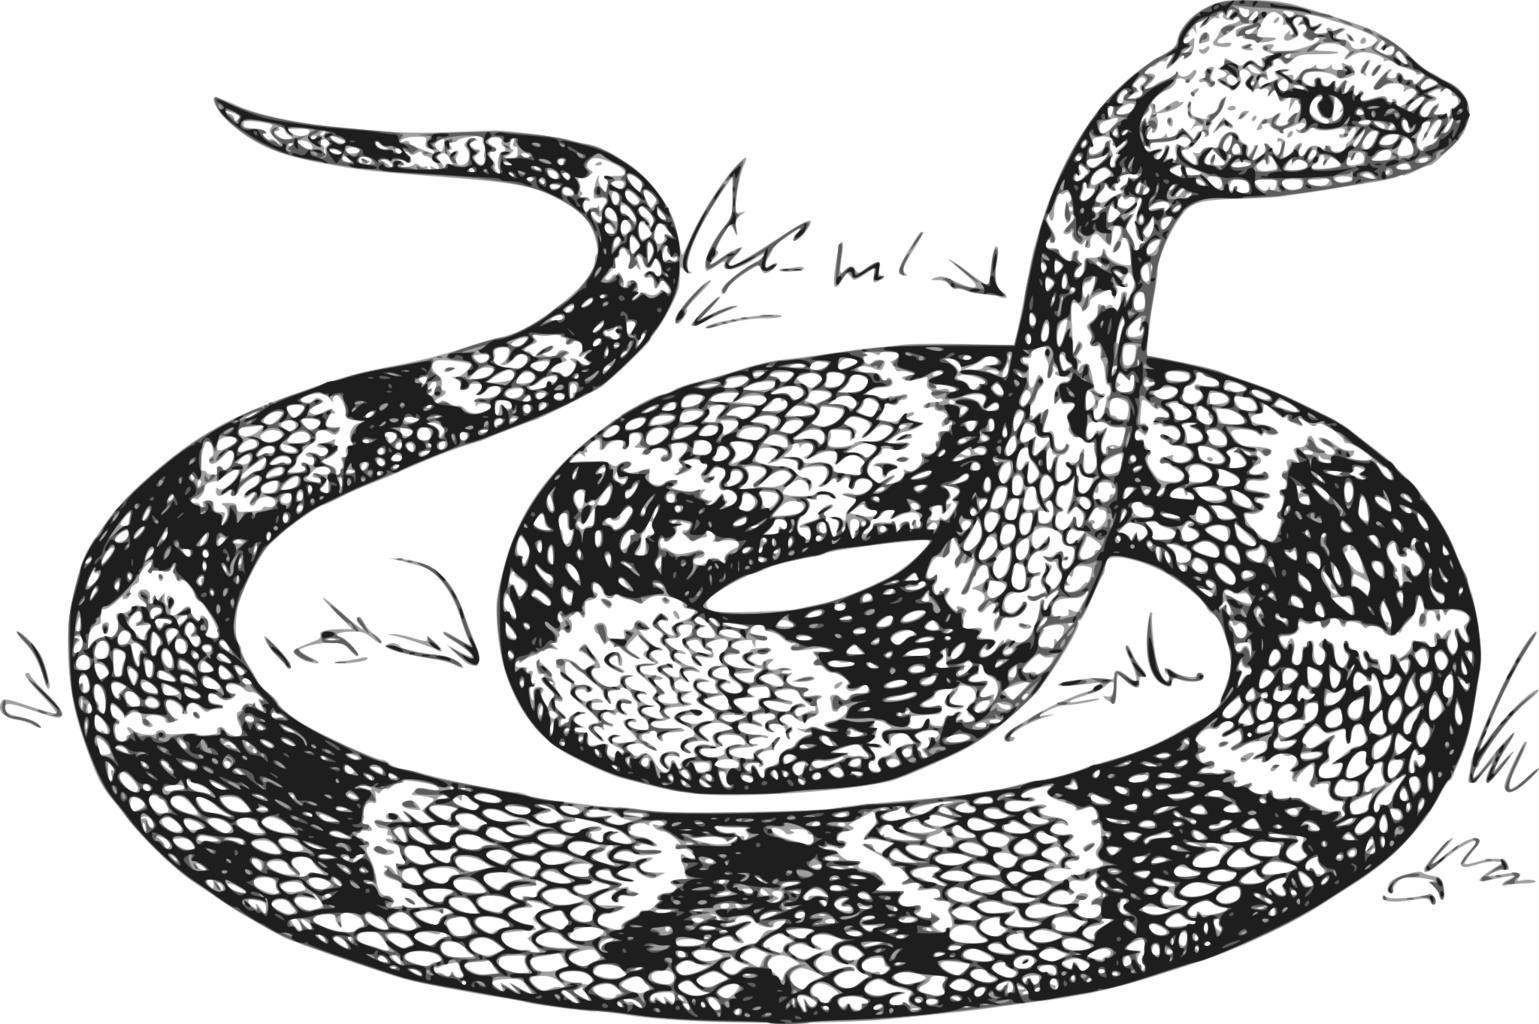 Free Images Com Free Public Domain Images Disegni Di Tatuaggio Serpente Disegni